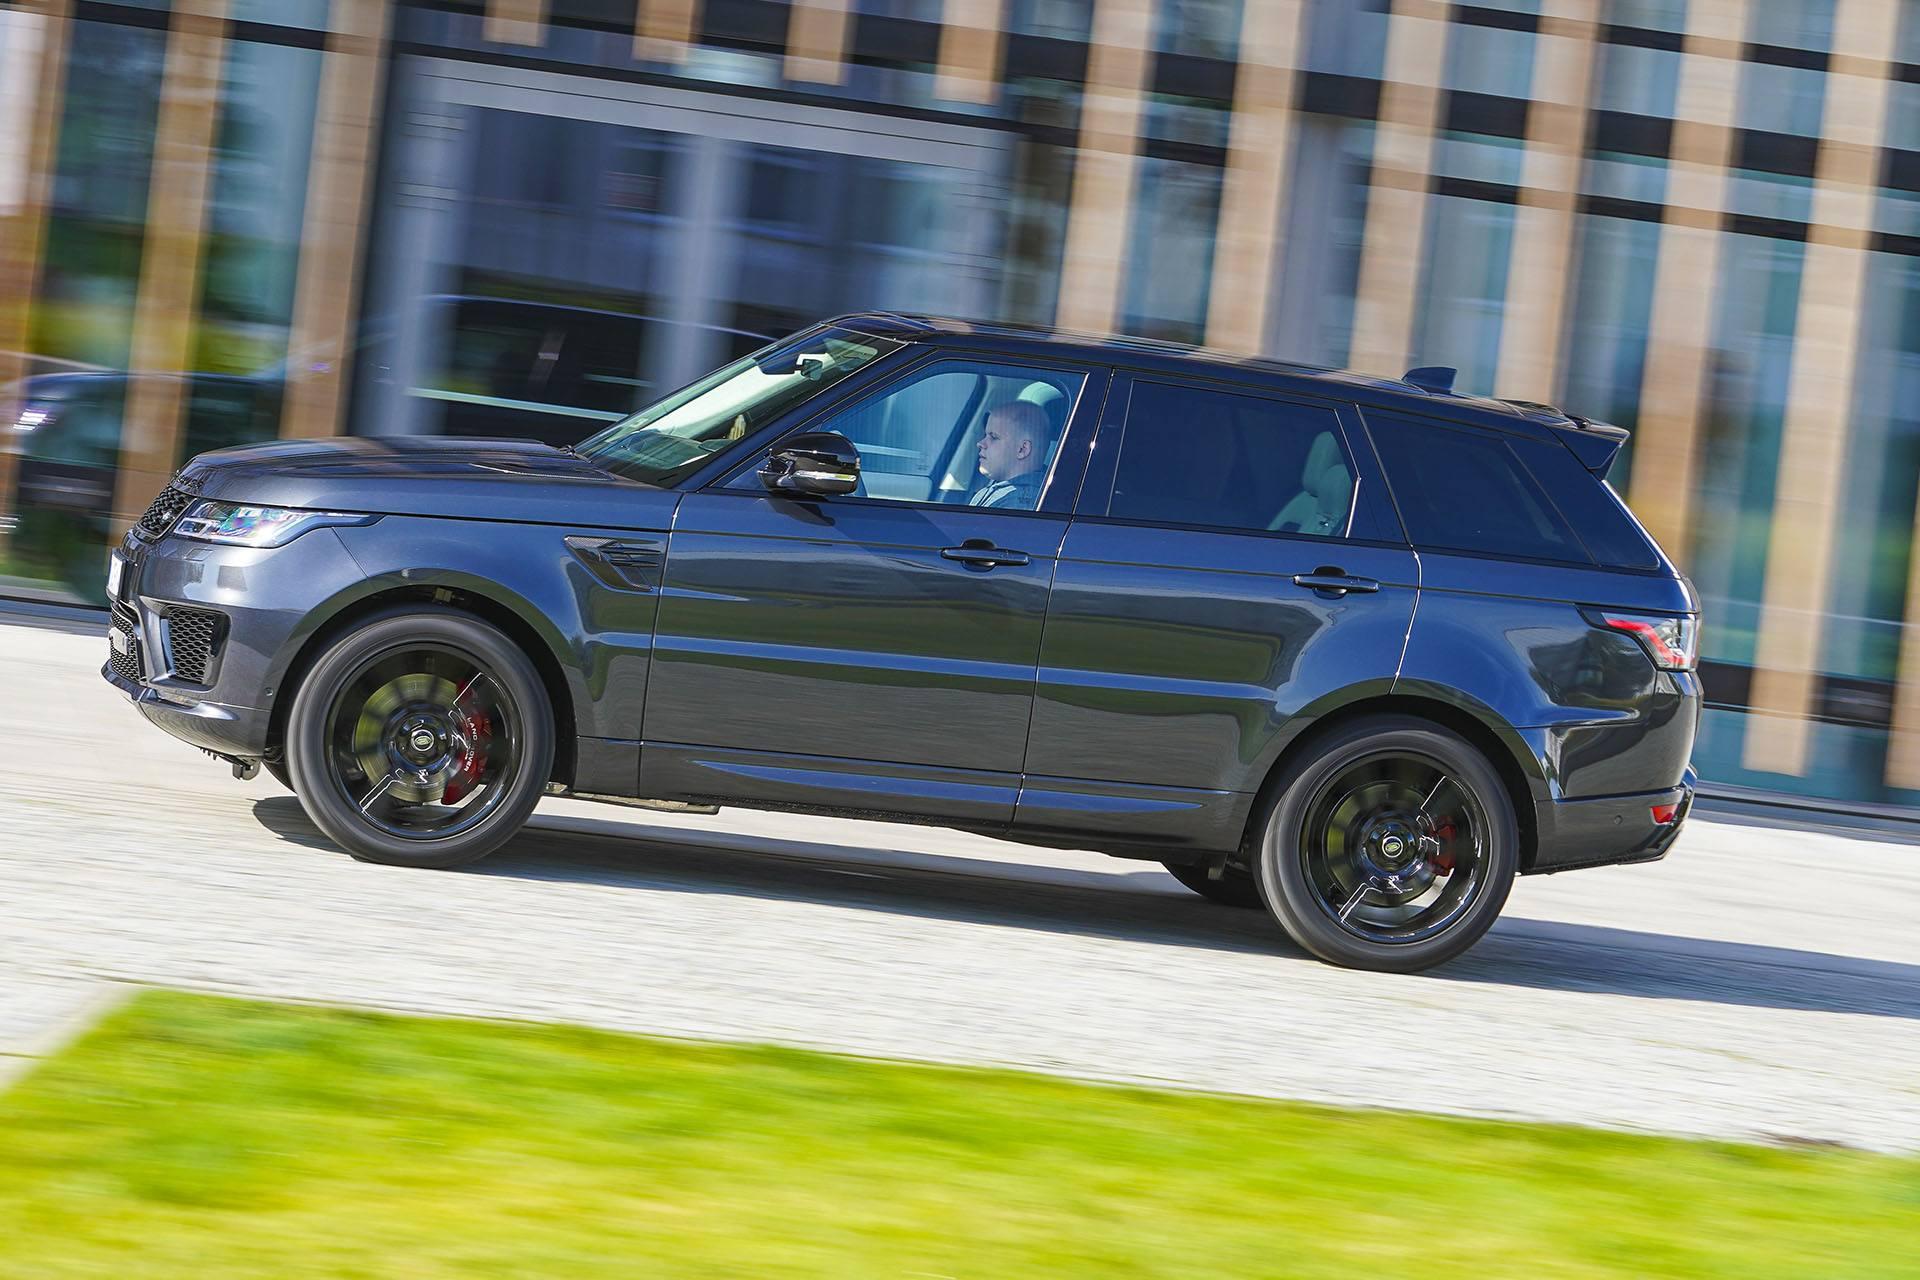 Range Rover Sport - bok - Land Rover Discovery, Mercedes GLE, Range Rover Sport, Volkswagen Touareg, Volvo XC90 – PORÓWNANIE –opinie, dane techniczne, wymiary